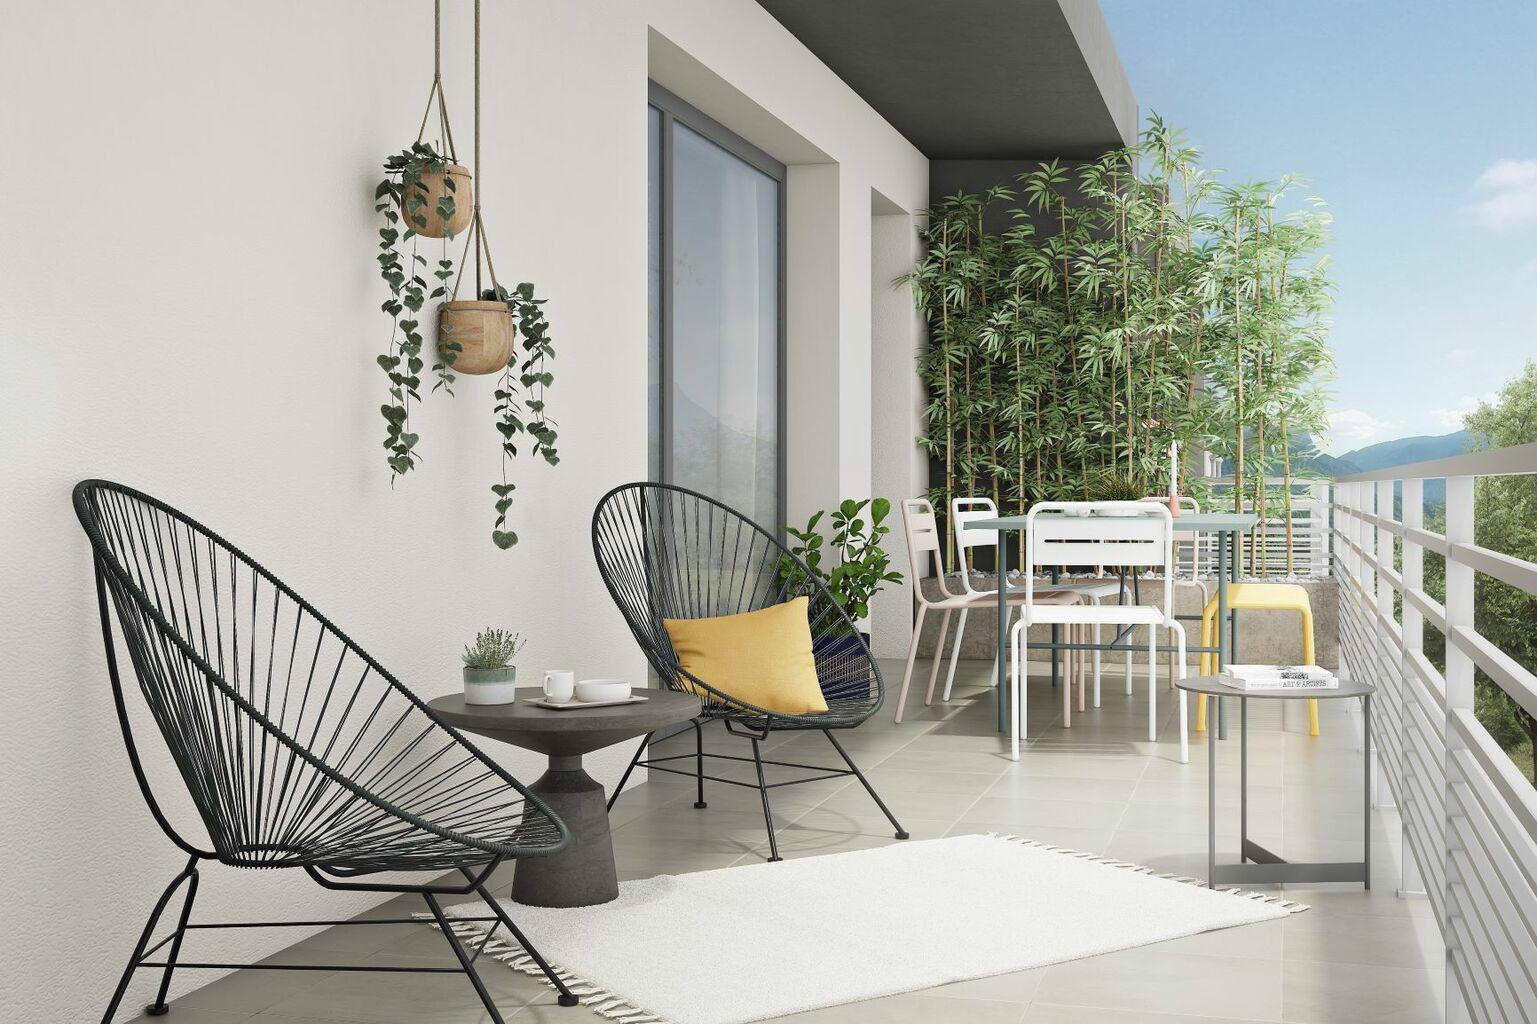 Programme immobilier VAL153 appartement à Neydens (74160) Cadre rural